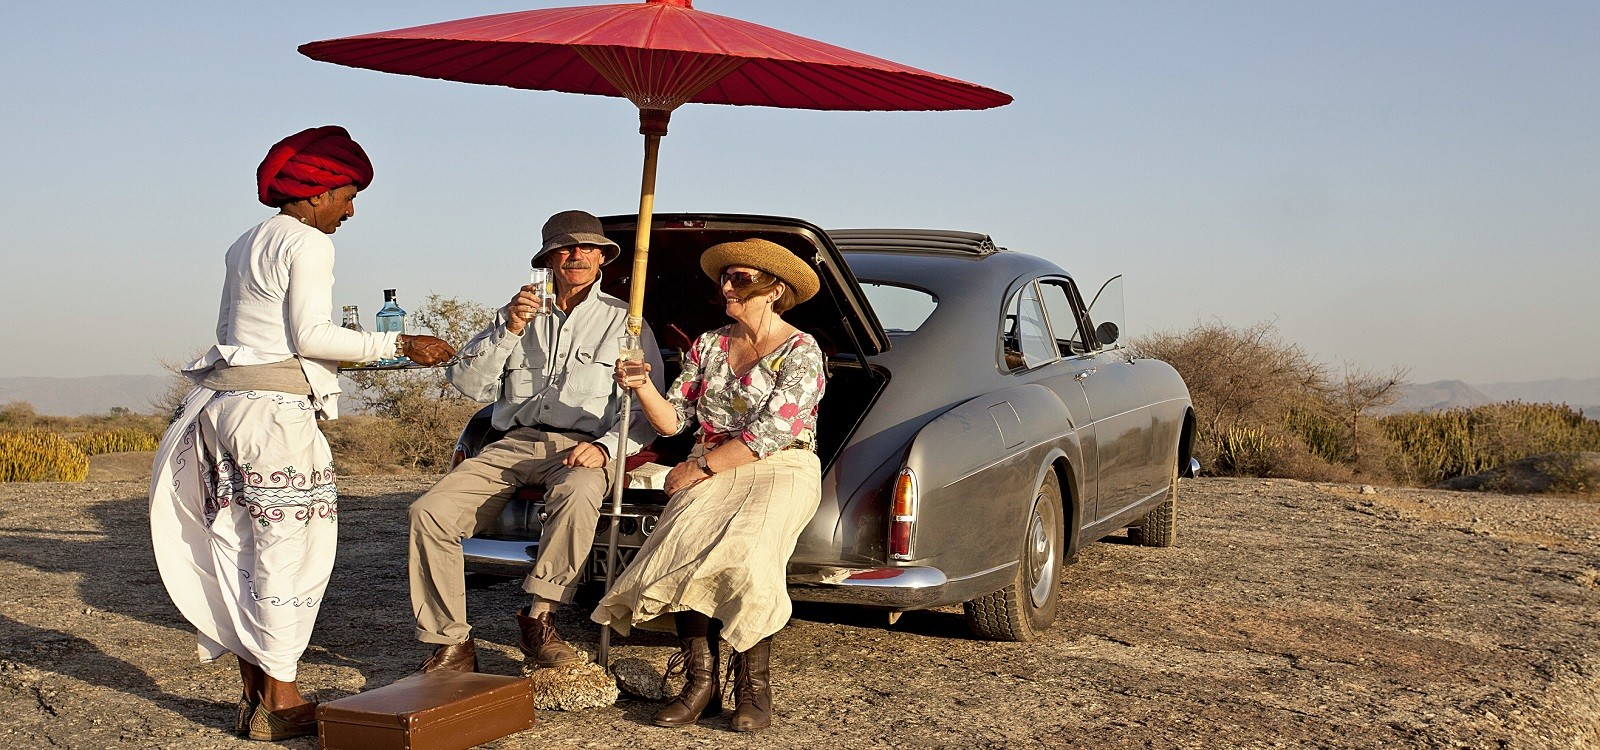 Enchanting Travels India Tours Jawai, Rajasthan (courtesy of Leopard Camp) (31)